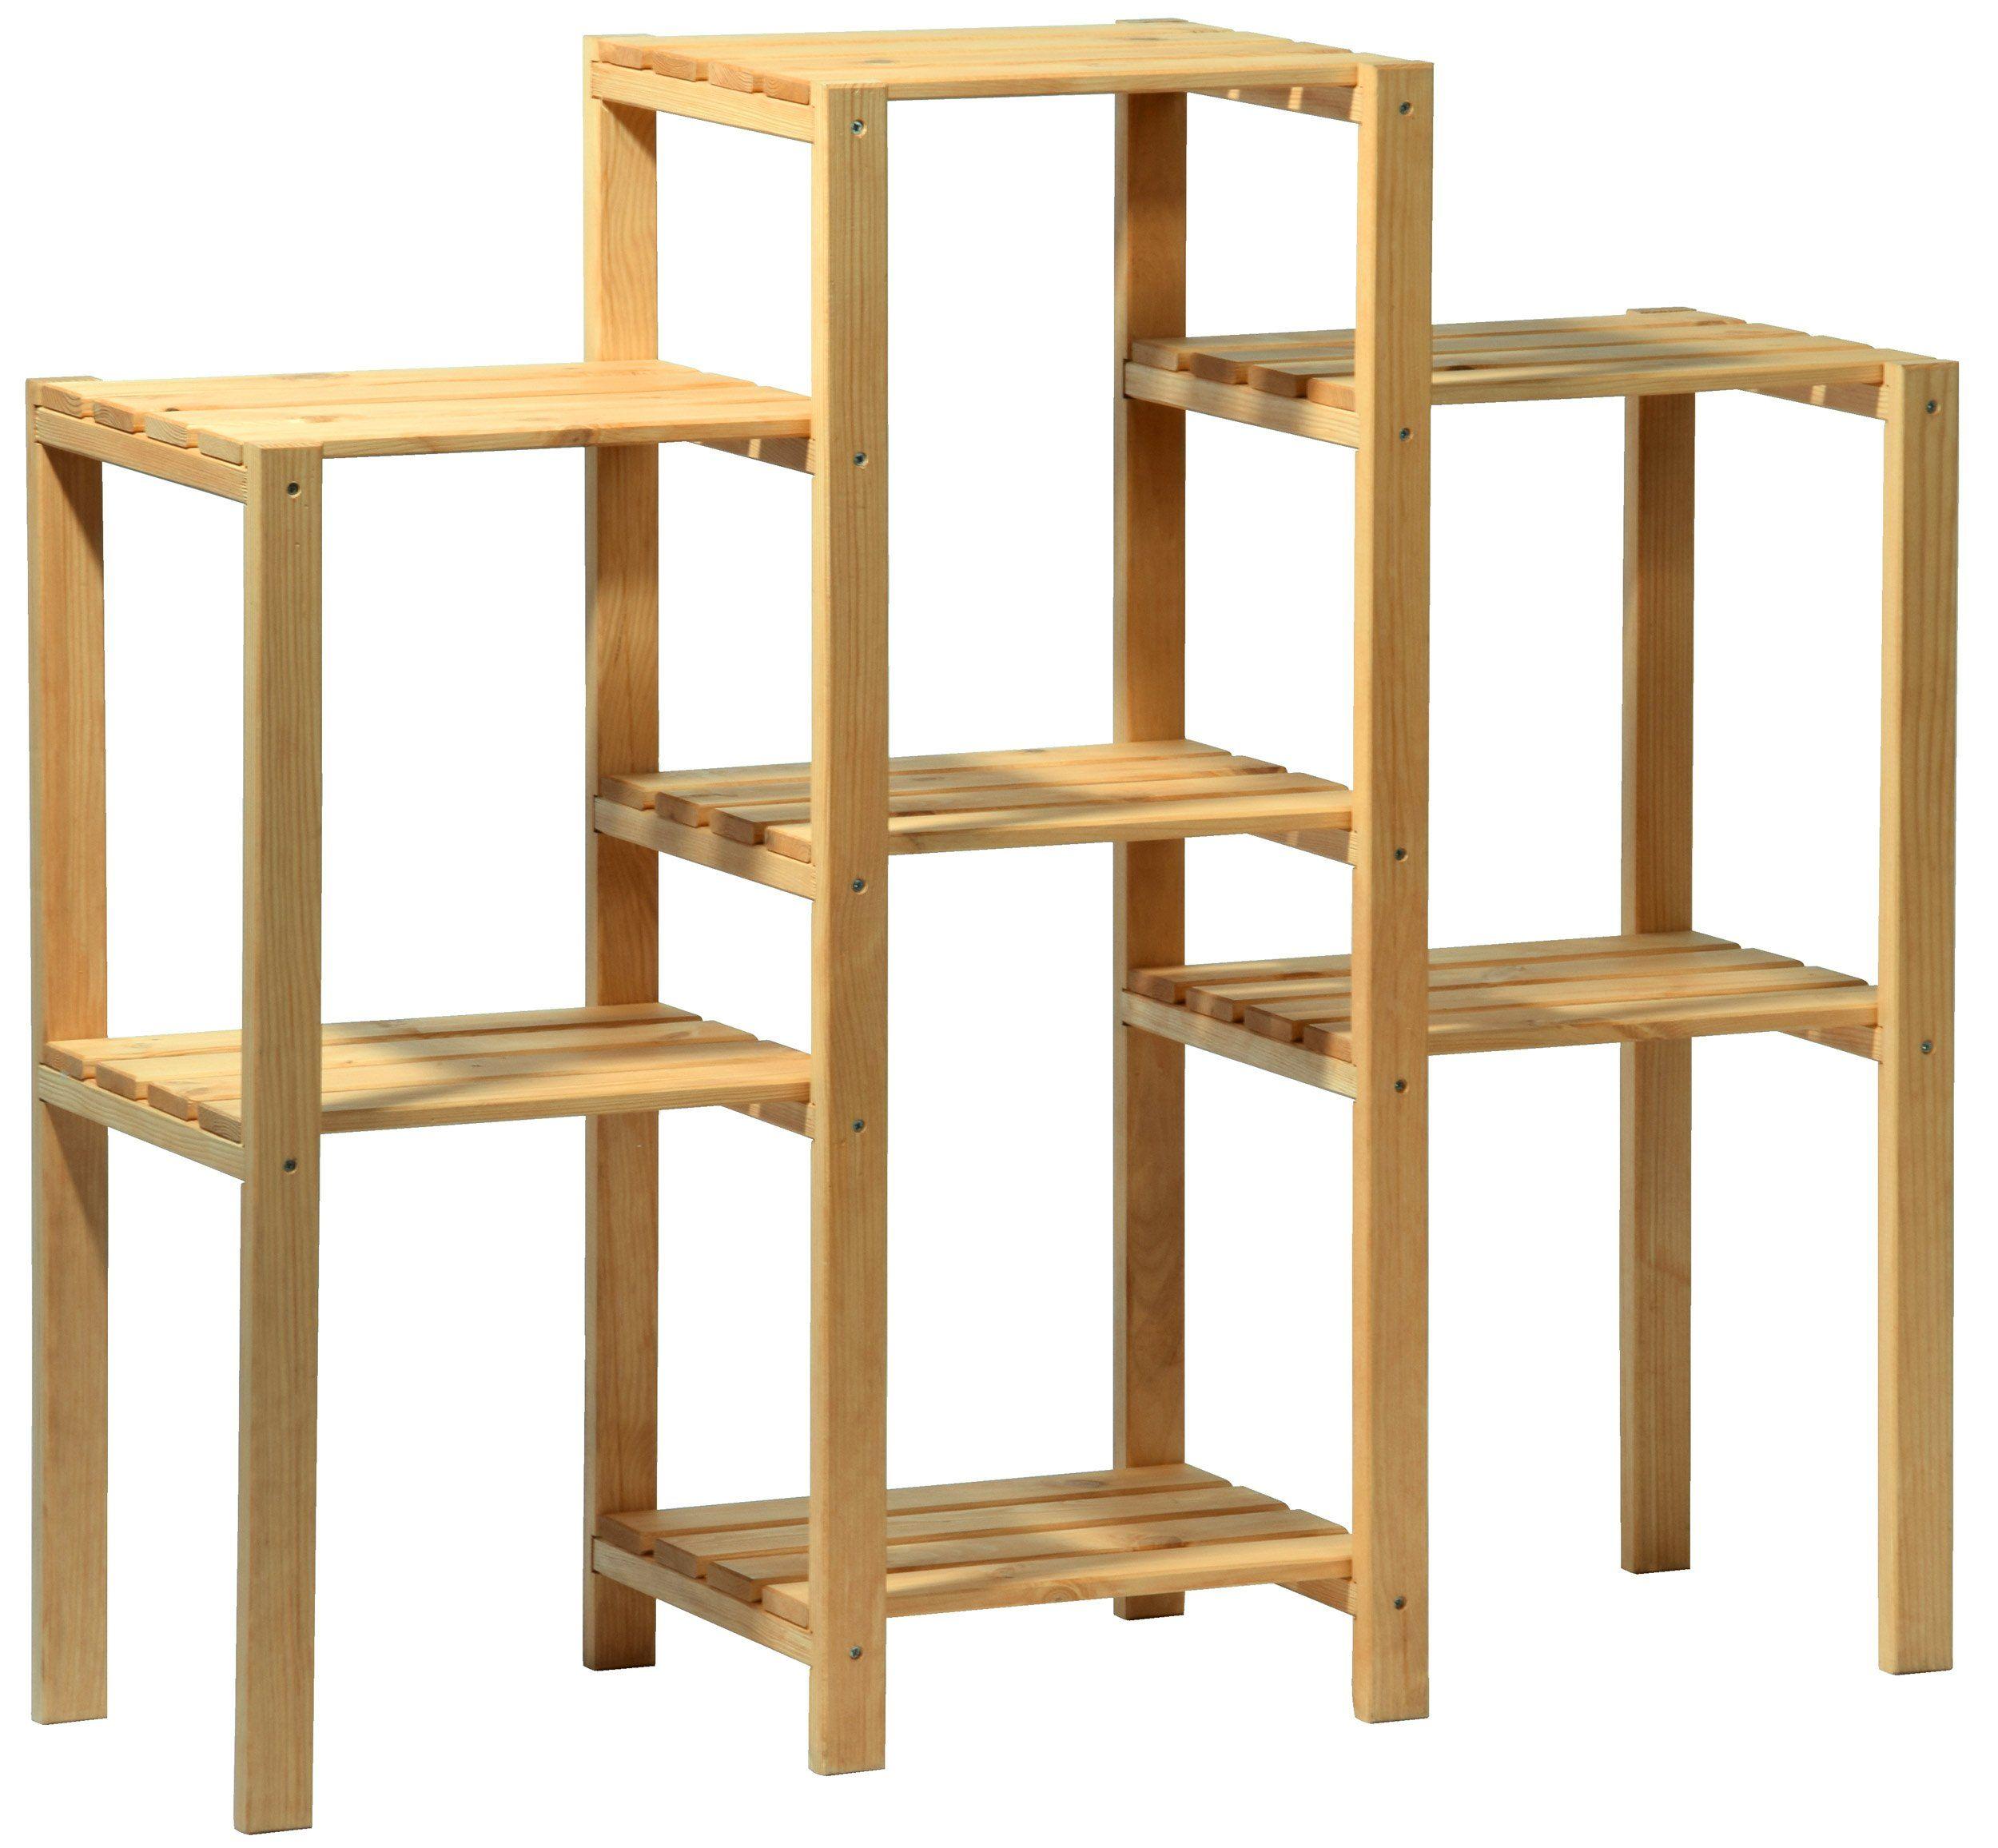 Dobar 29053 estanter a decorativa para macetas madera - Madera para estantes ...